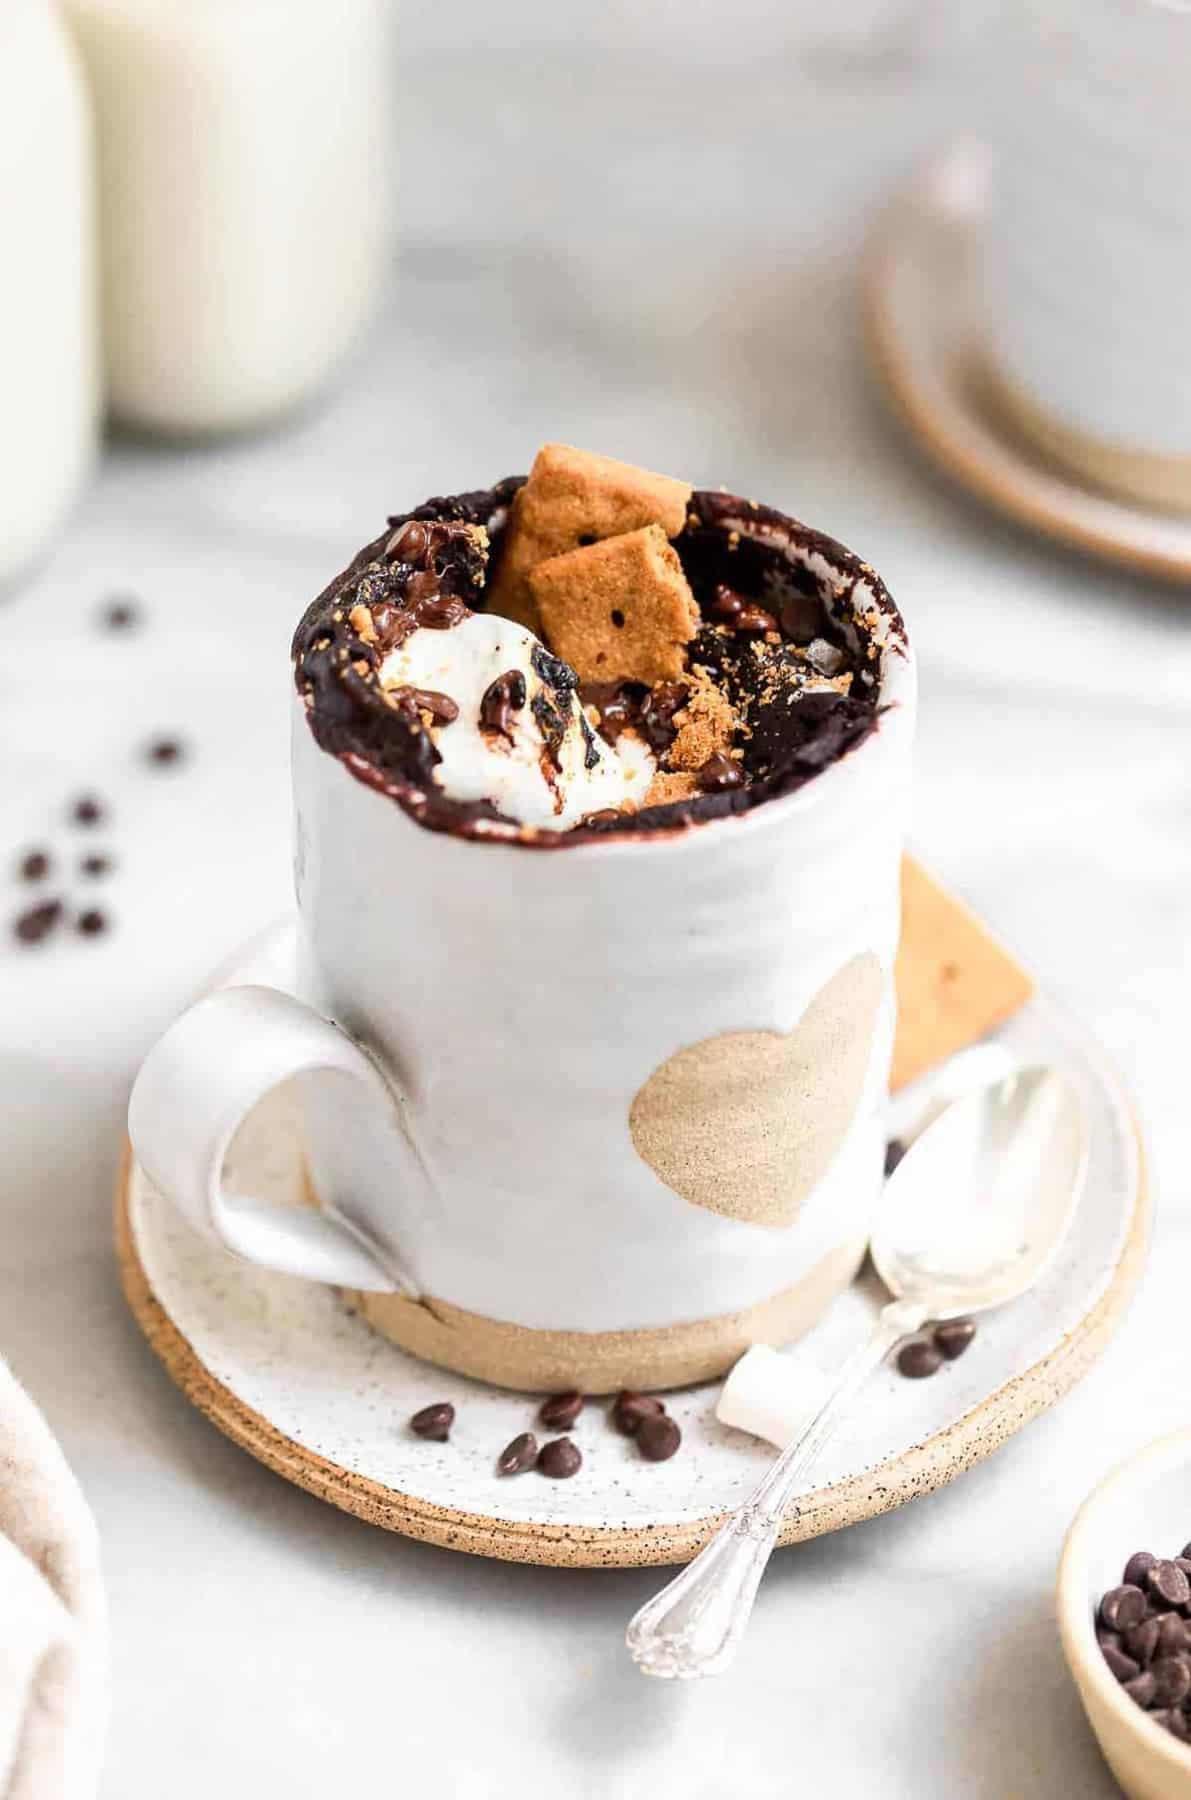 Gluten free chocolate mug cake with marshmallows.